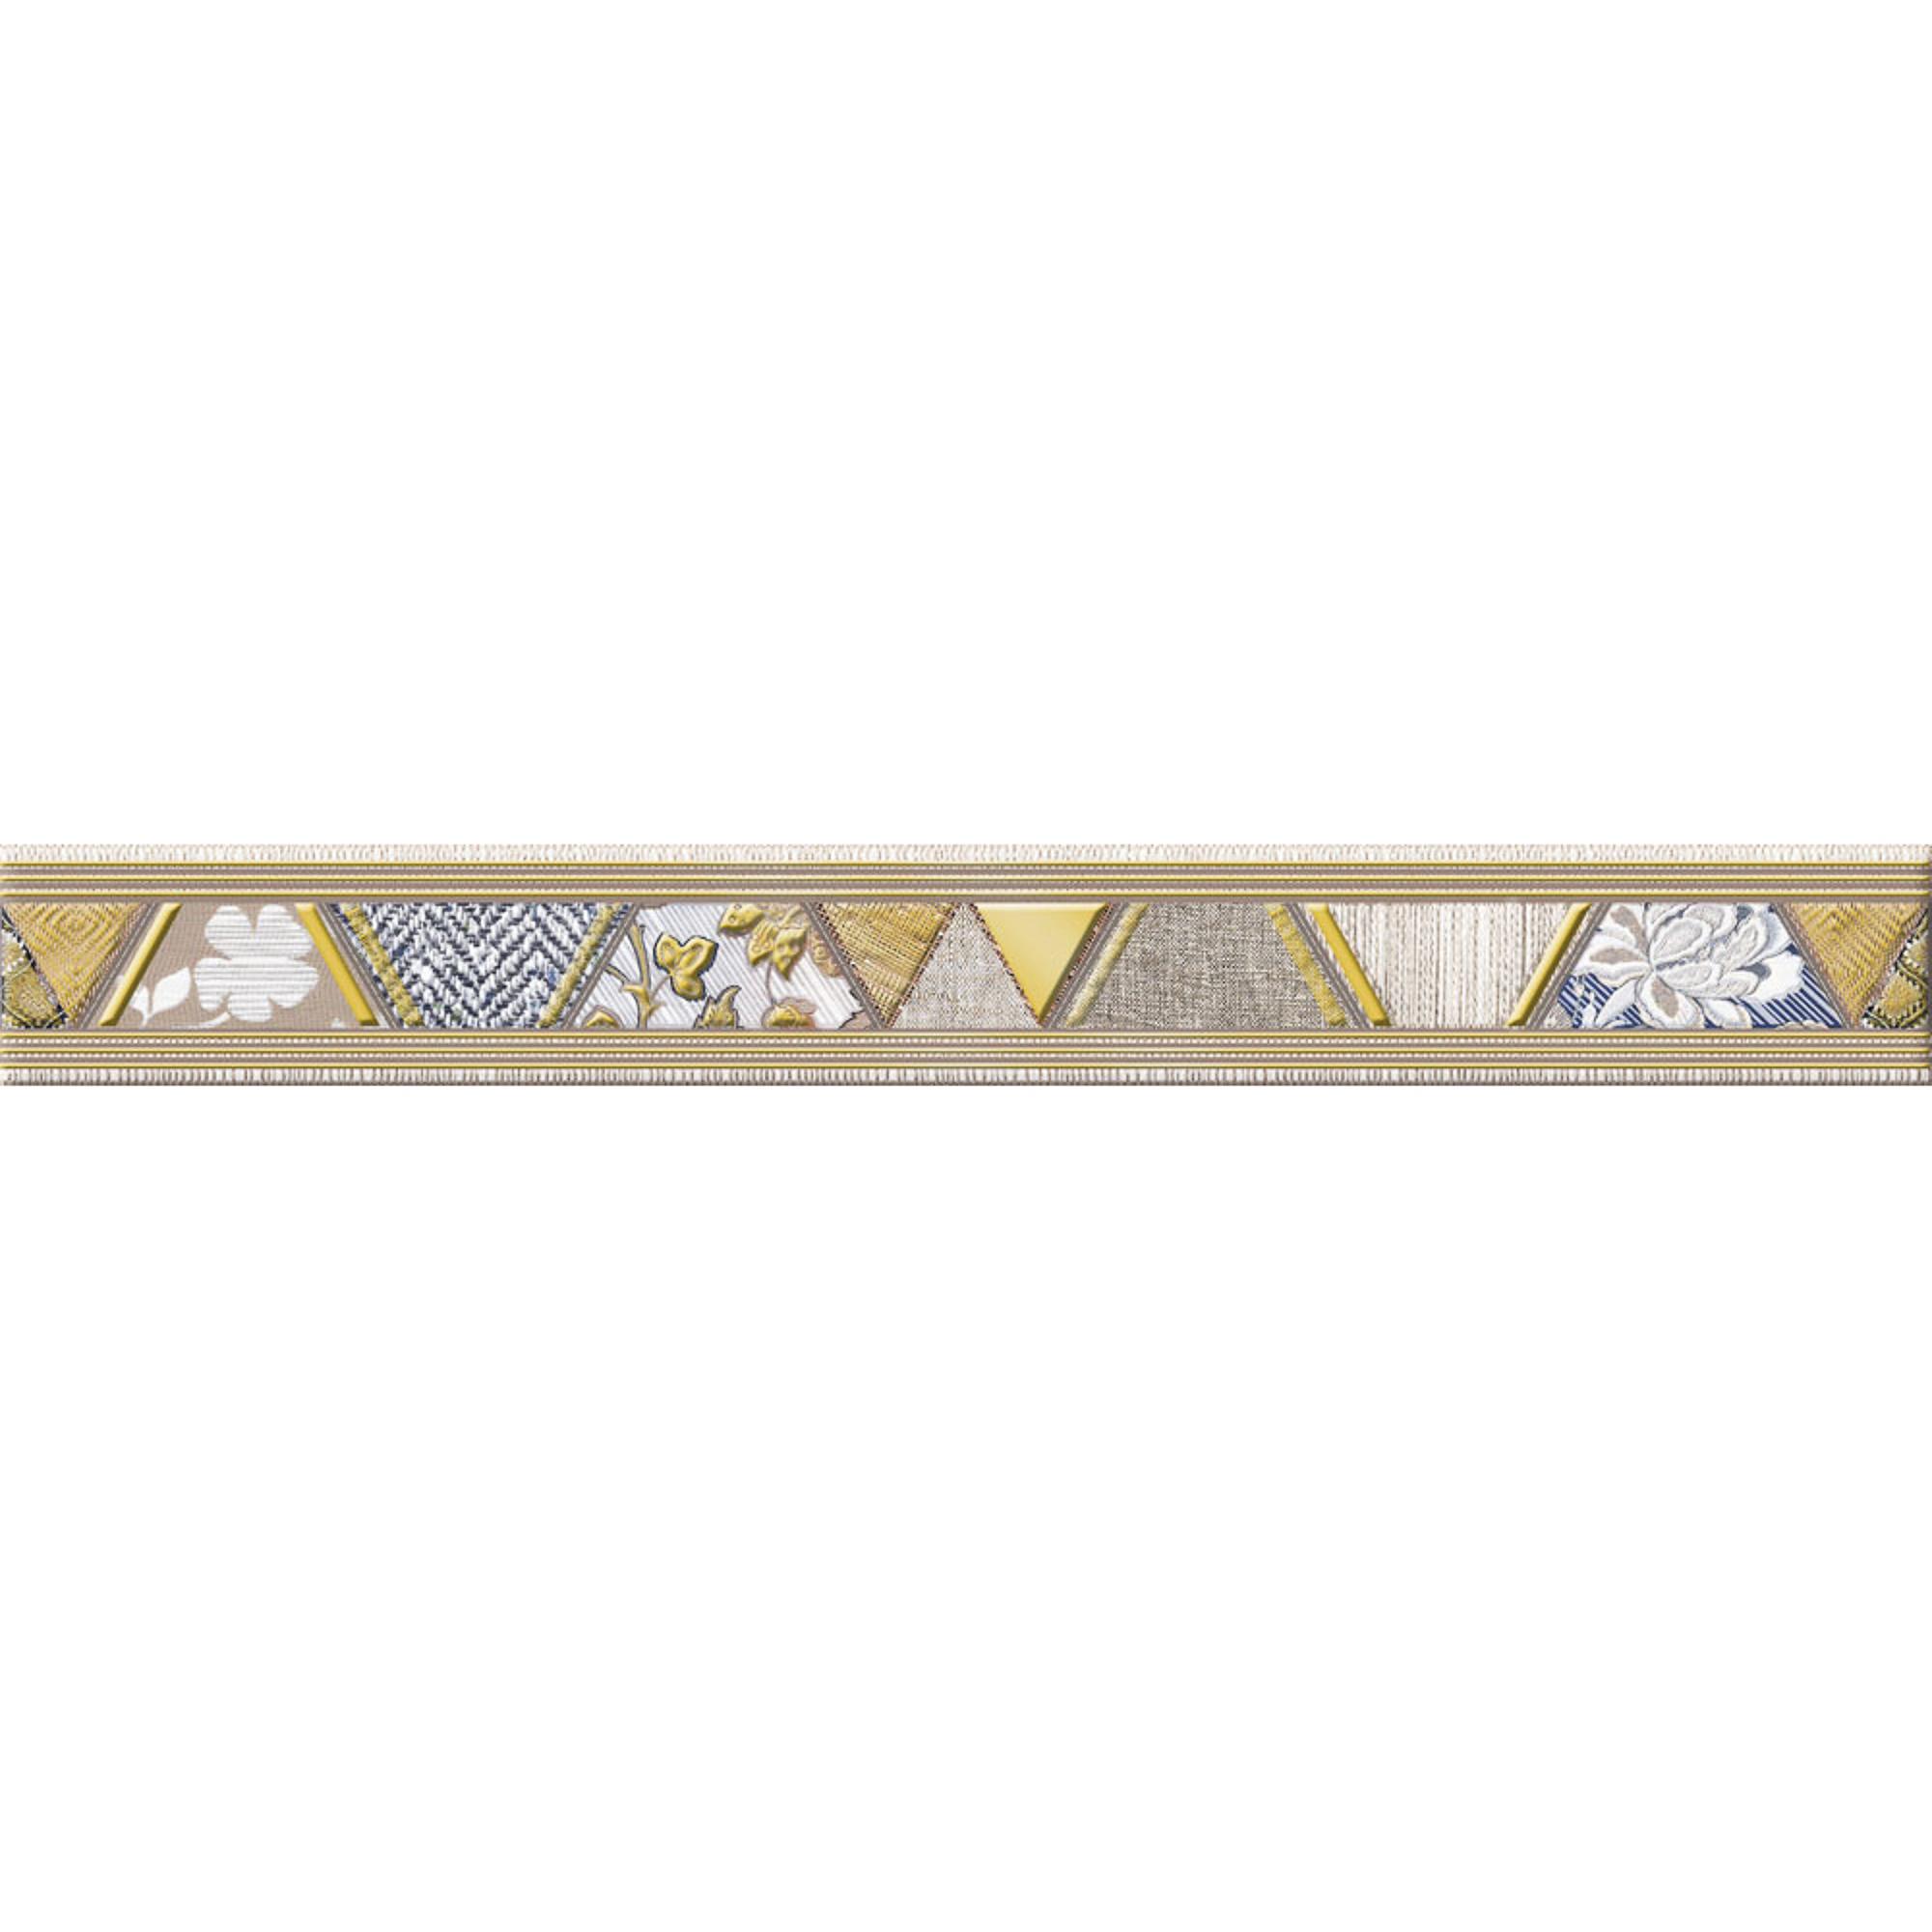 Бордюр Alma Ceramica Asteria BWU57ATR404 6,7x50 см декор alma ceramica grigio dwu09grg027 24 9x50 см